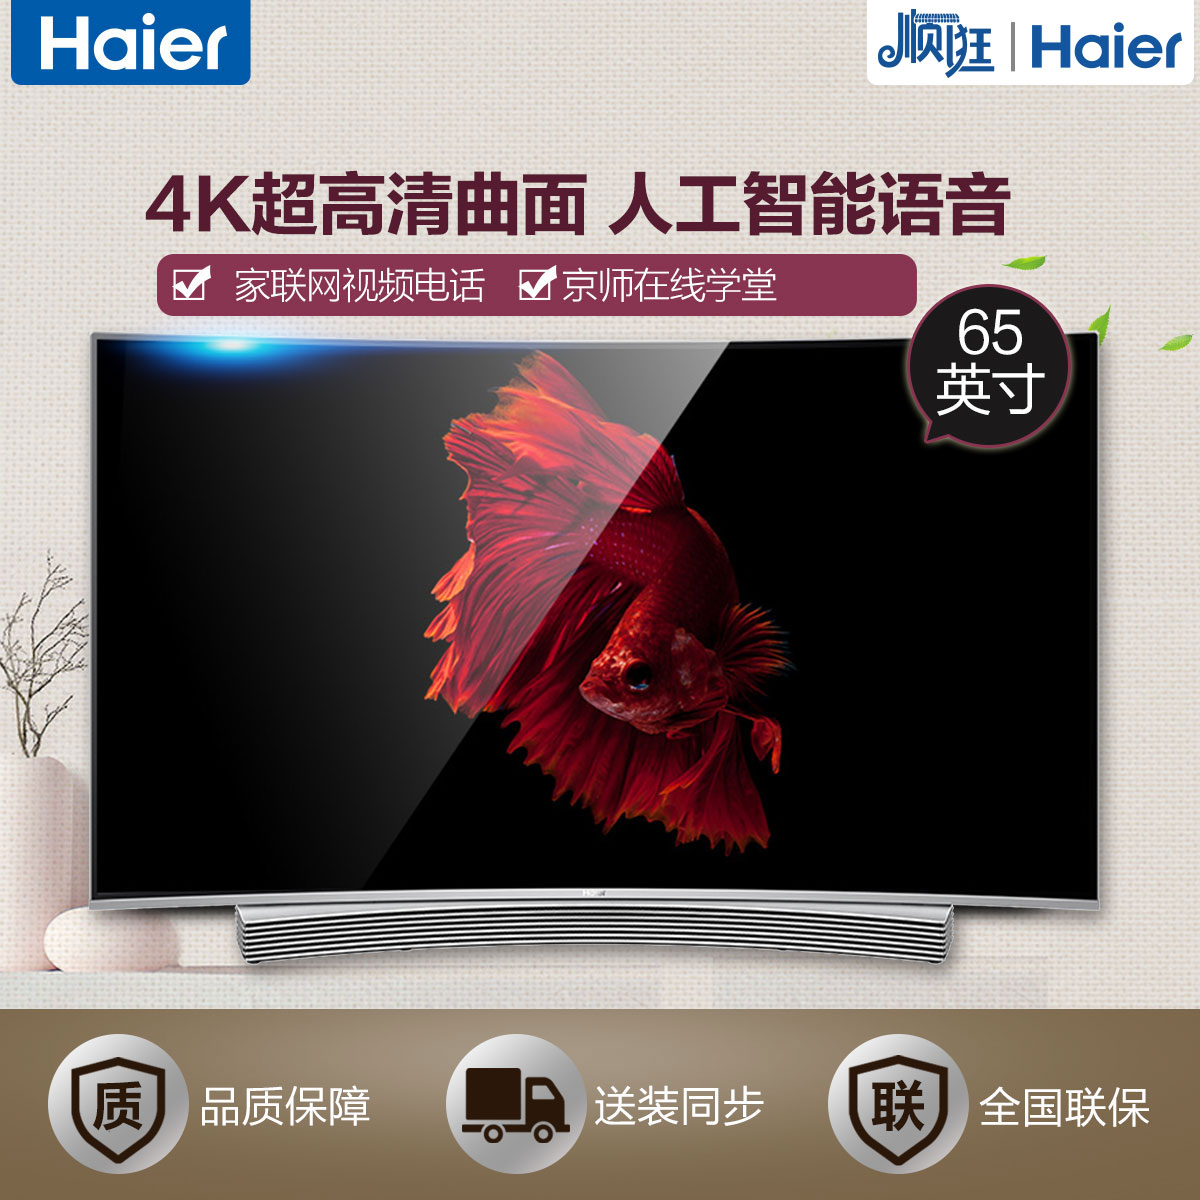 Haier/海尔             曲面屏电视             LQ65AL88M92